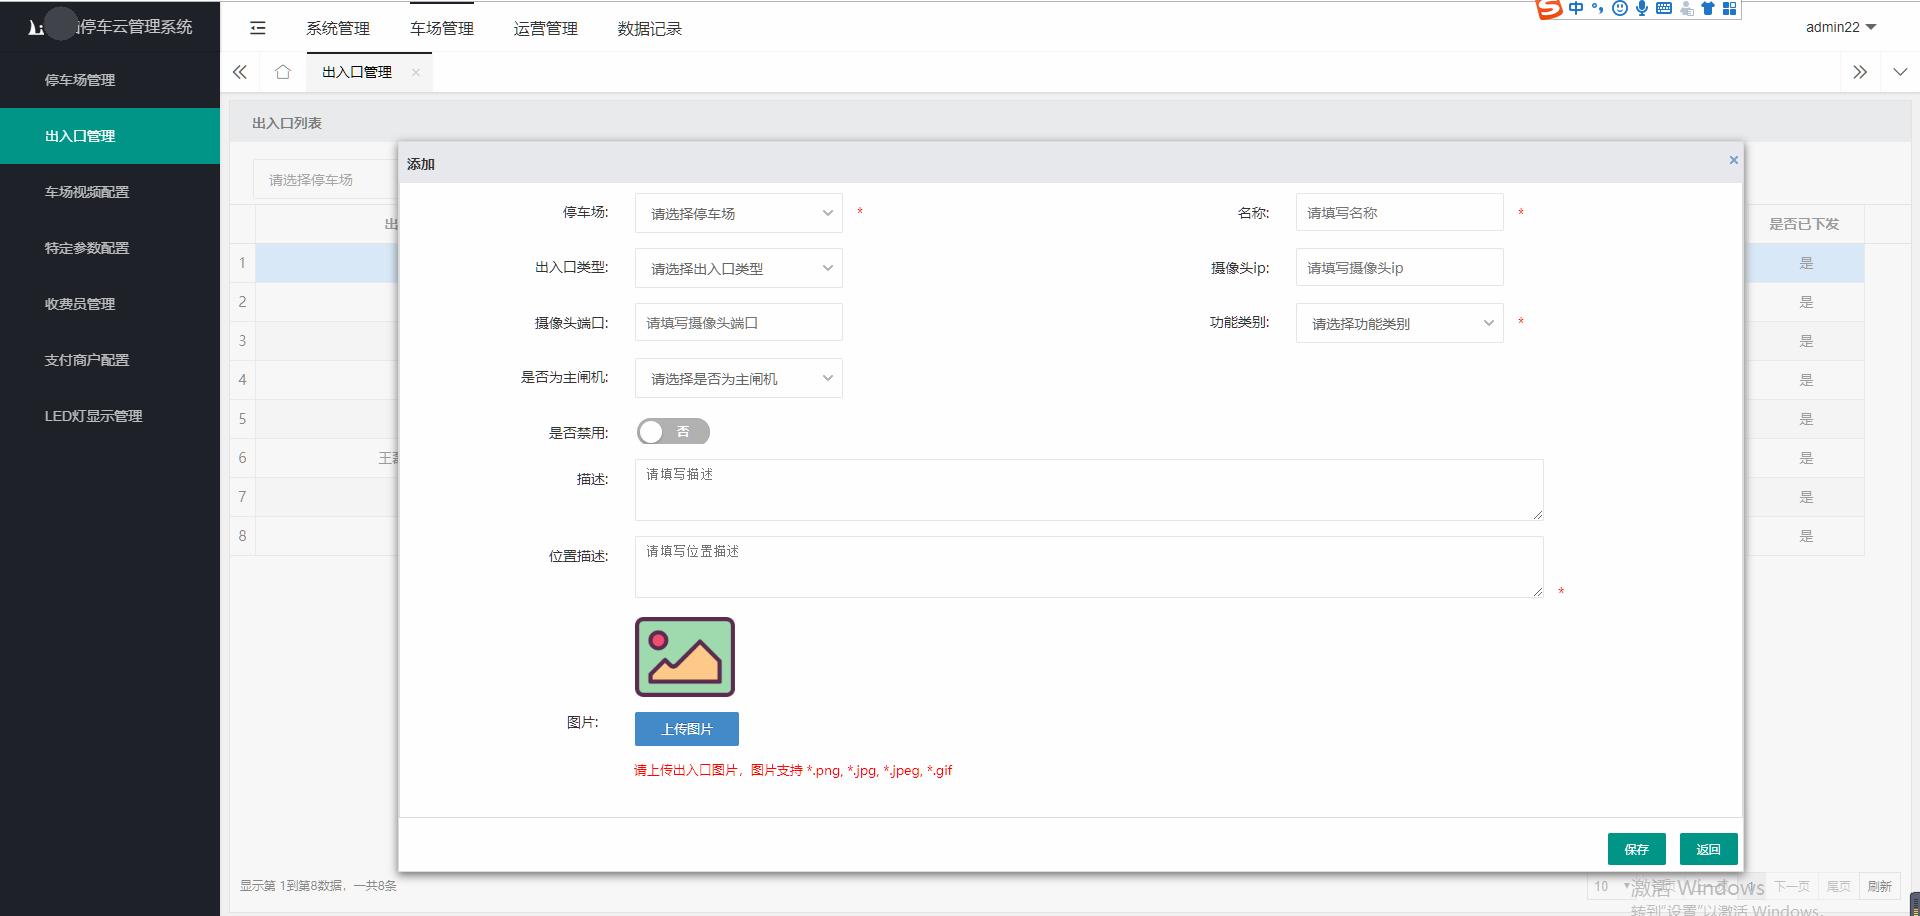 出入口_看图王.png